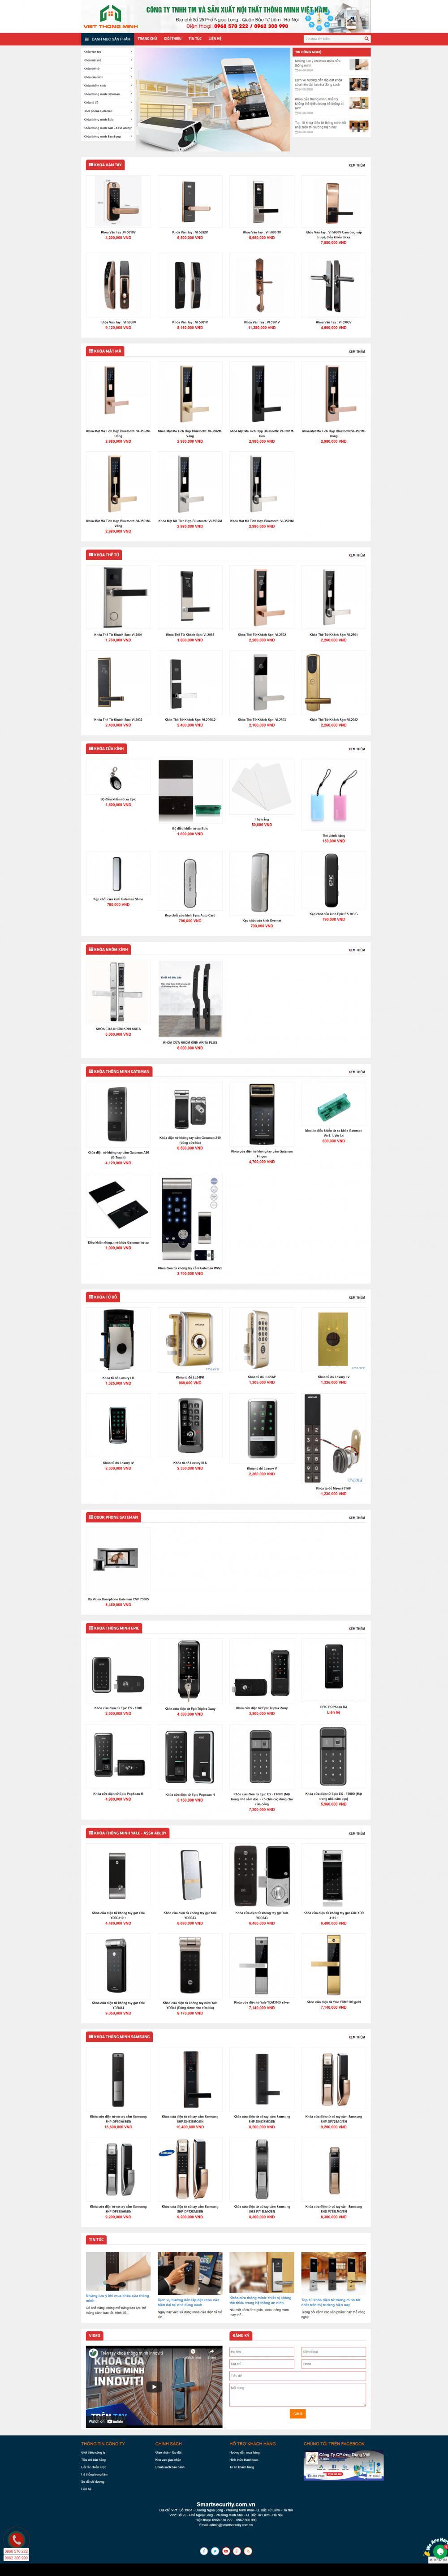 smartsecurity.com.vn